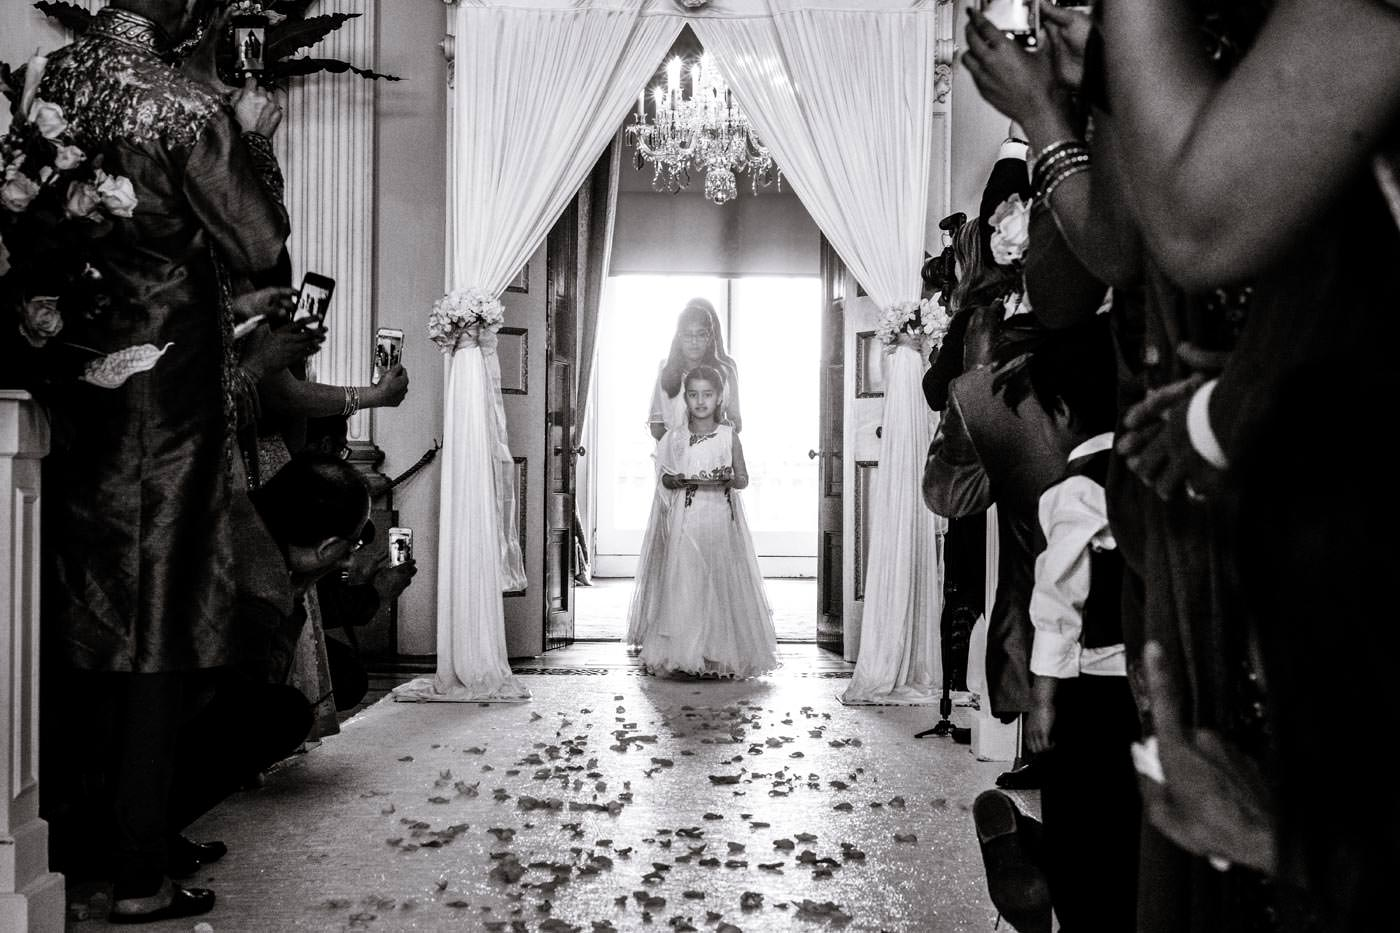 Bridesmaid arrival for the Hindu wedding celebration at Ragley Hall